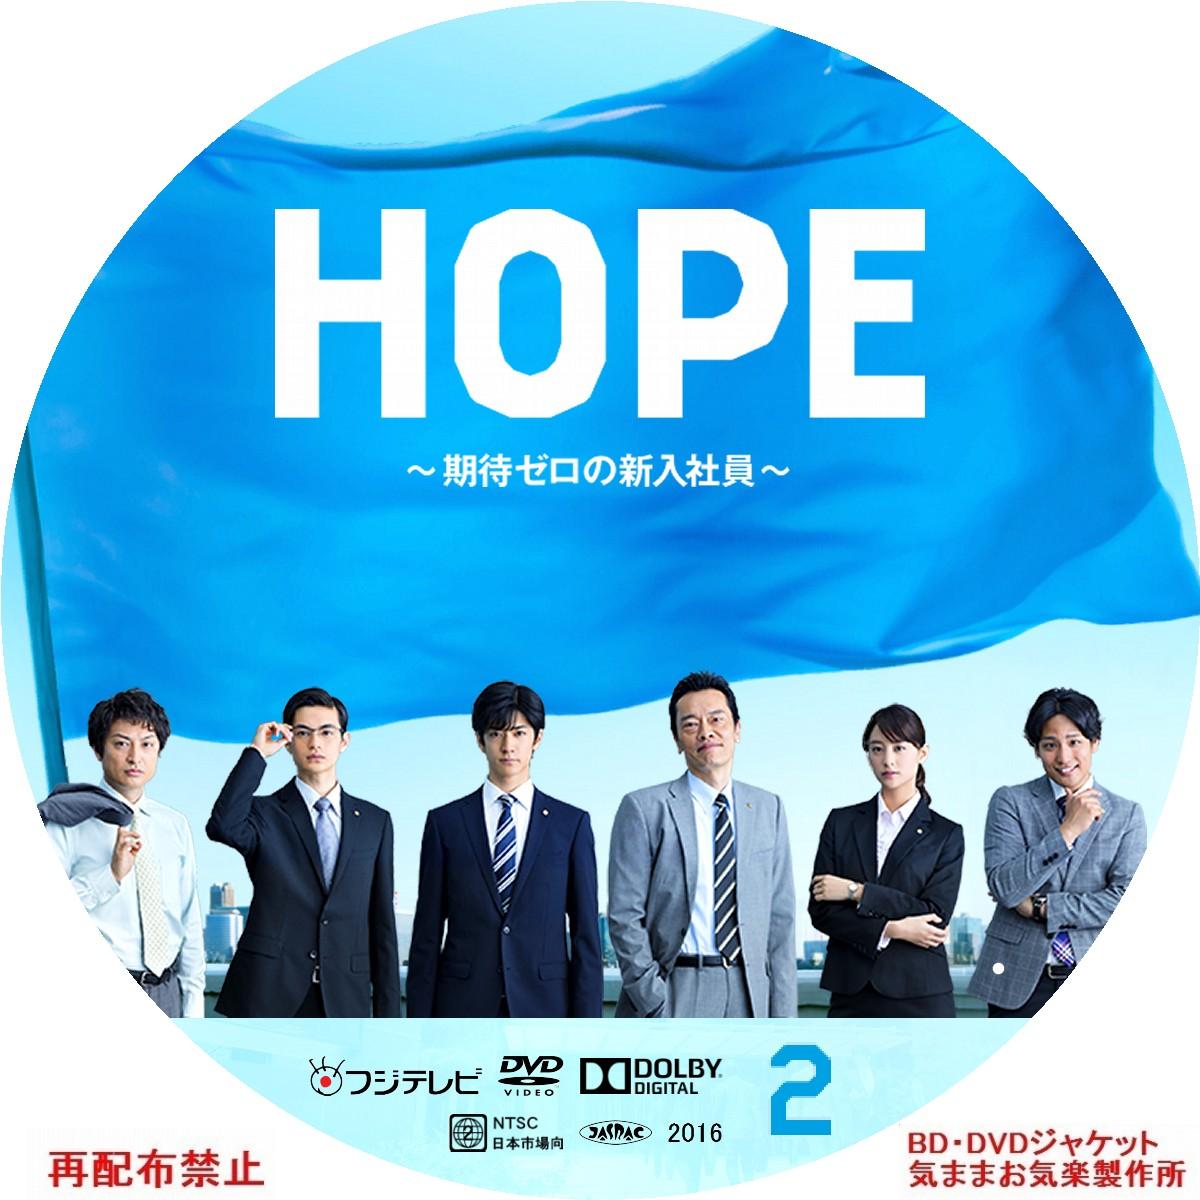 HOPE_02.jpg